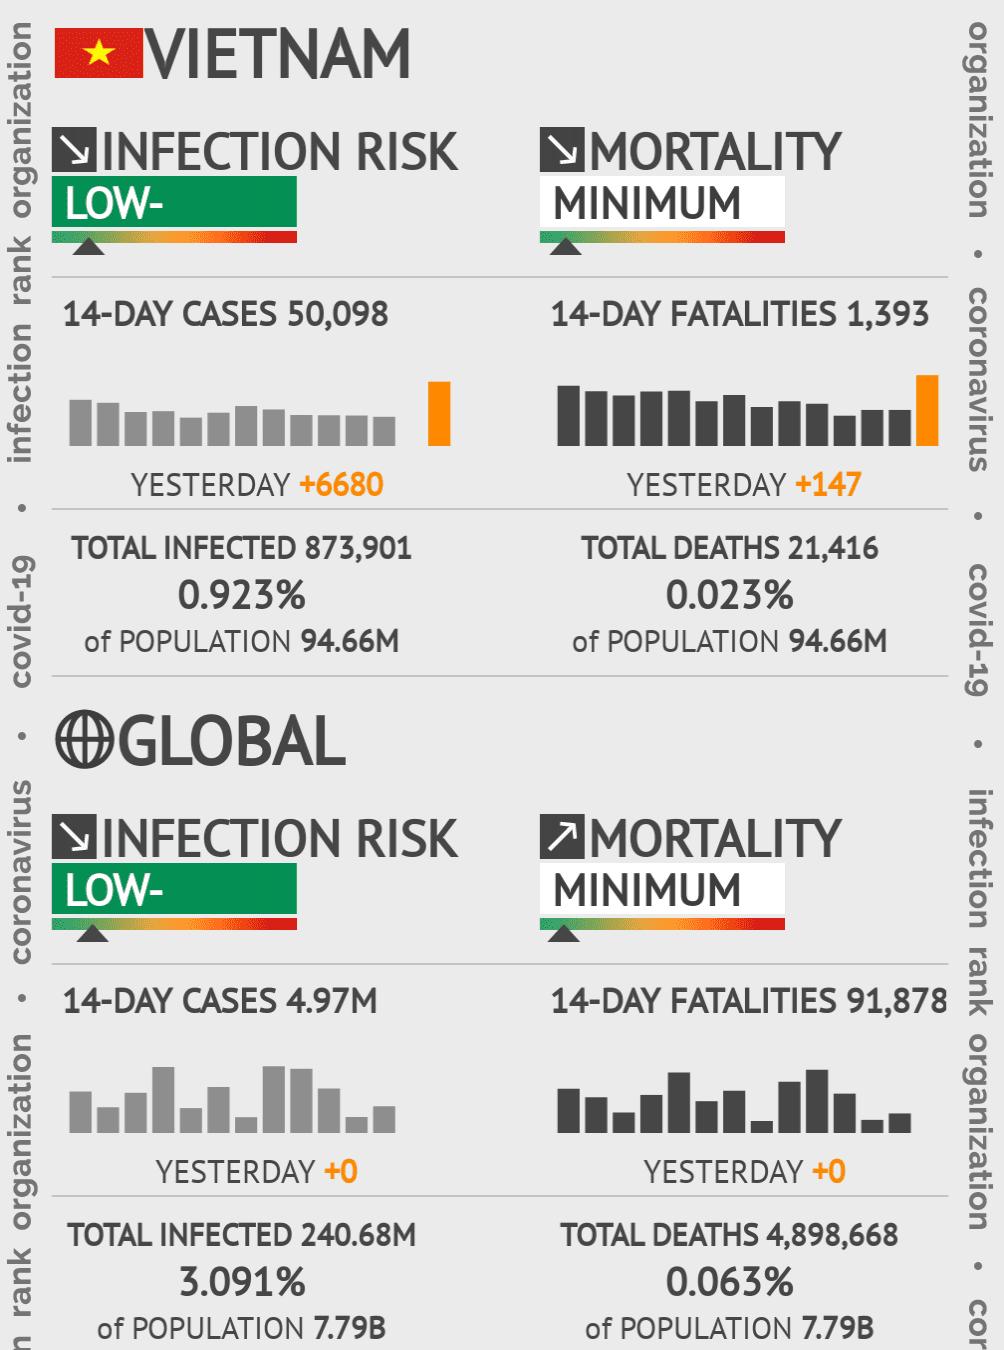 Vietnam Coronavirus Covid-19 Risk of Infection on October 26, 2020